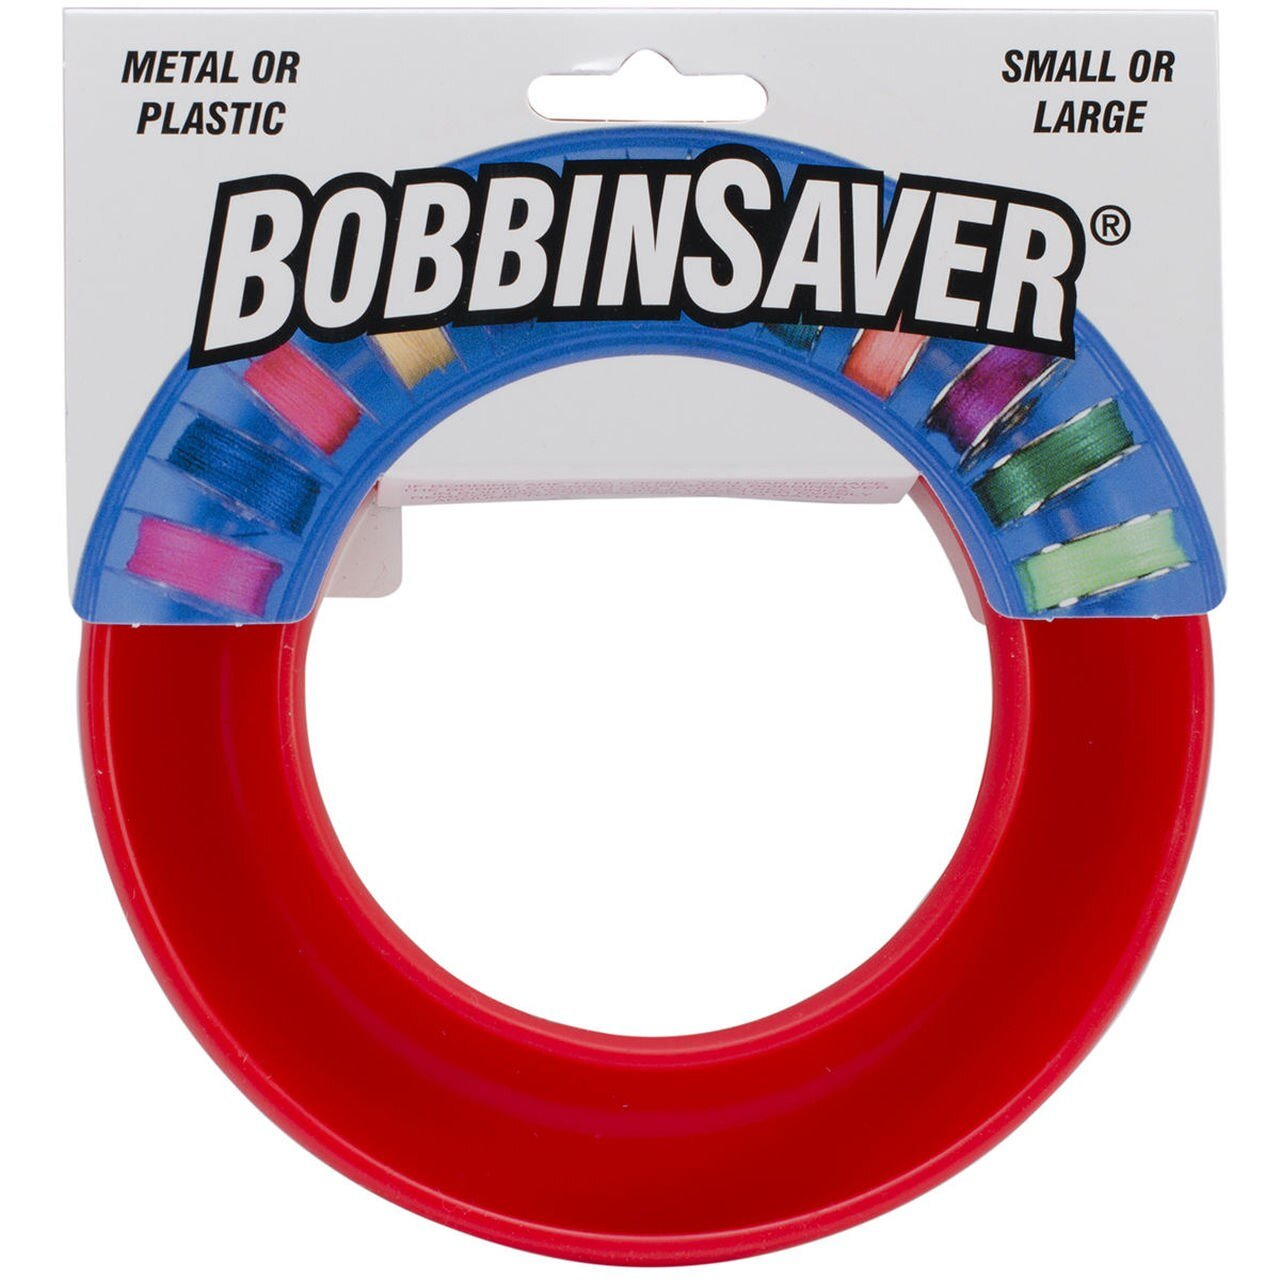 Grabbit BobbinSaver - Red